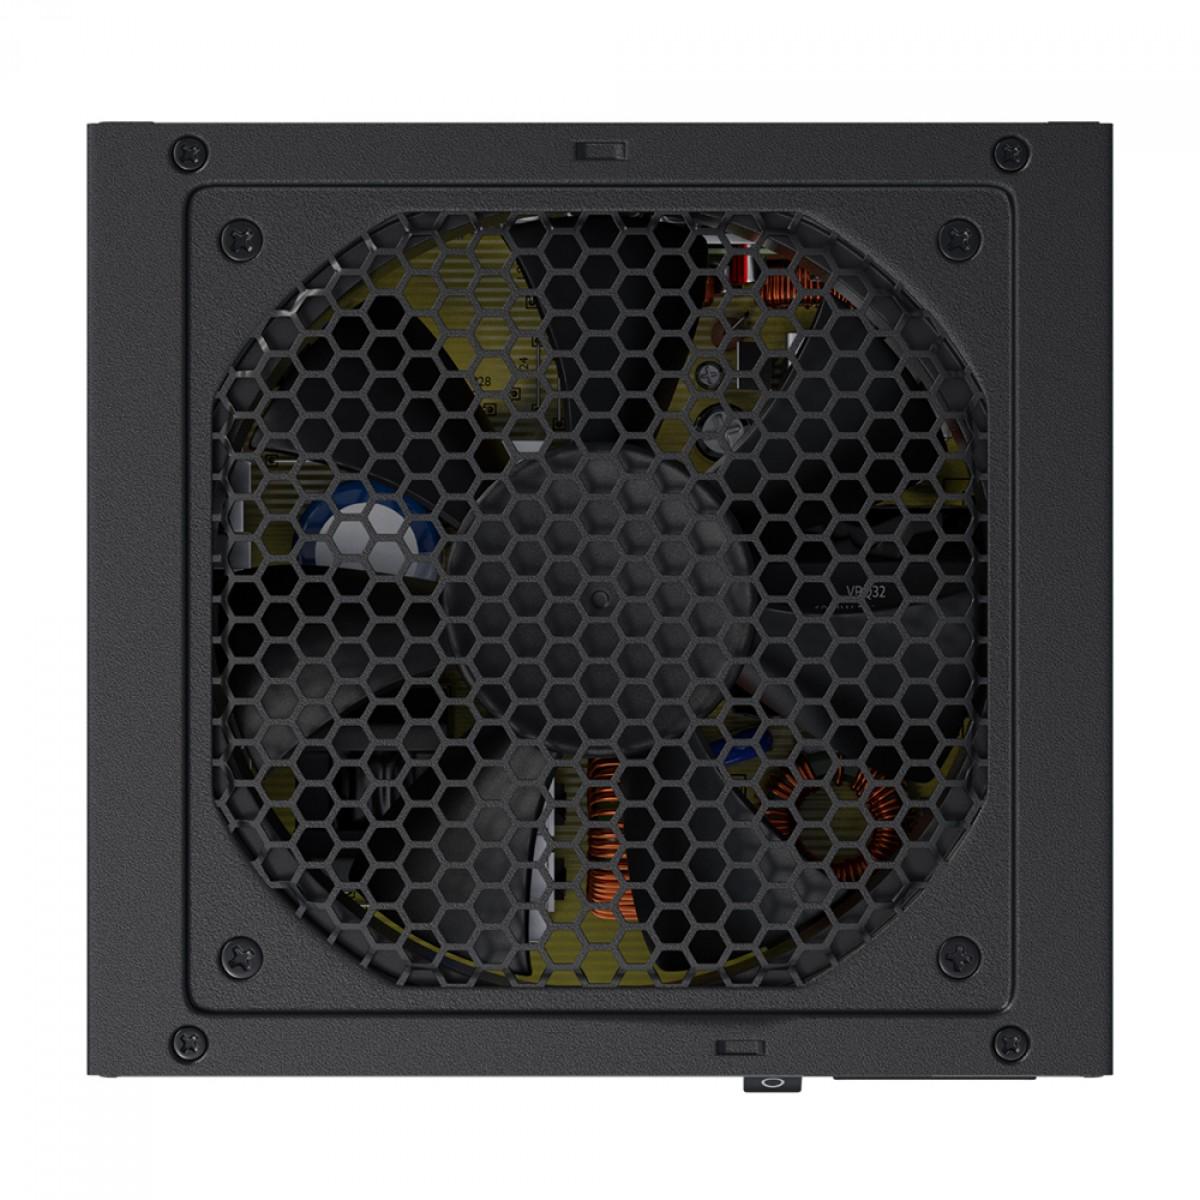 Fonte Seasonic Core GX-500, 500W, 80 Plus Gold, Full Modular